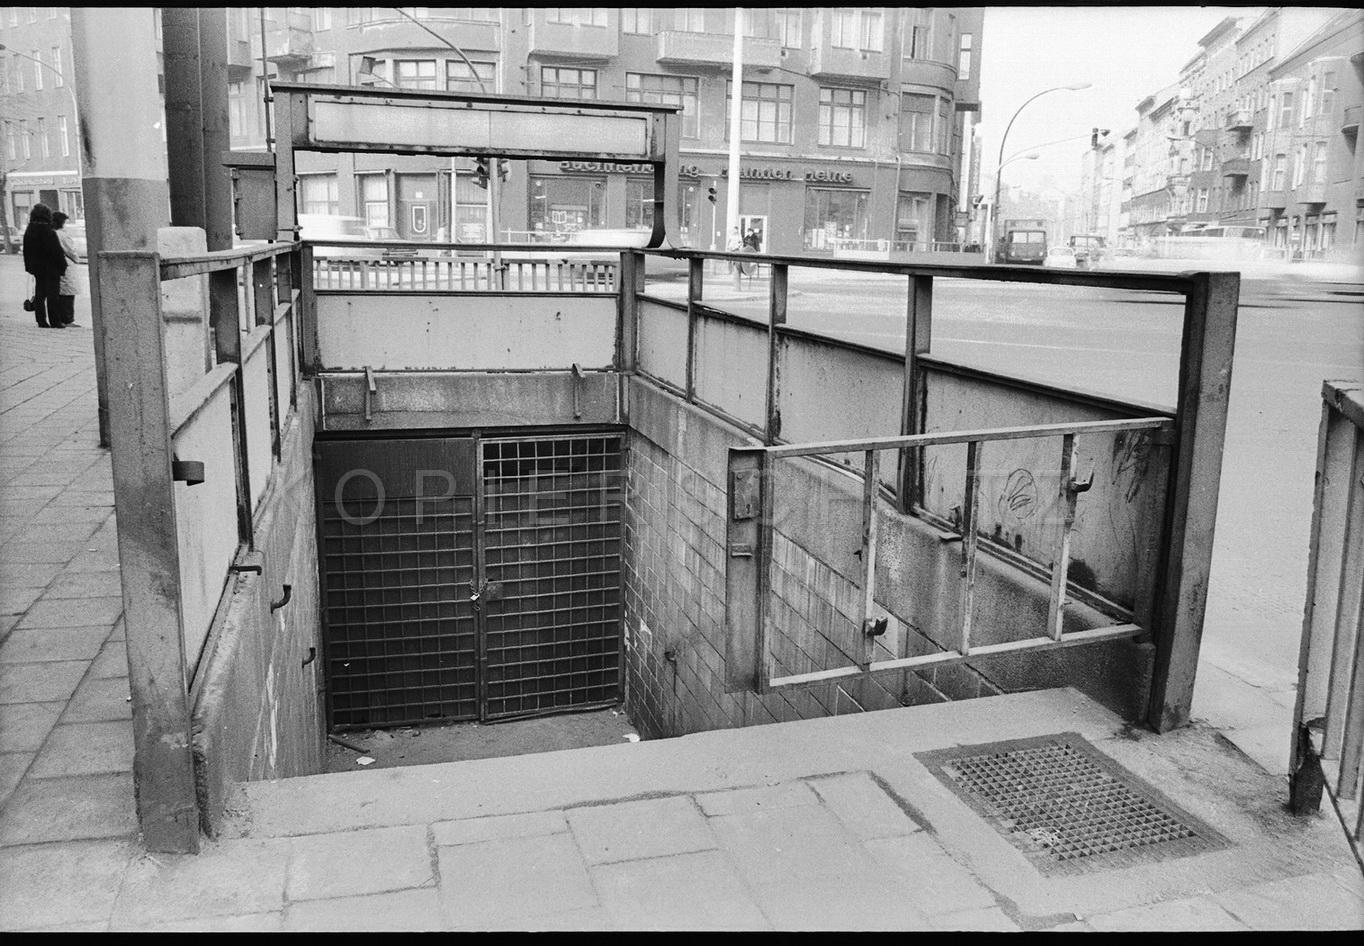 Nr01-103_Rosenthaler-Platz-April1985